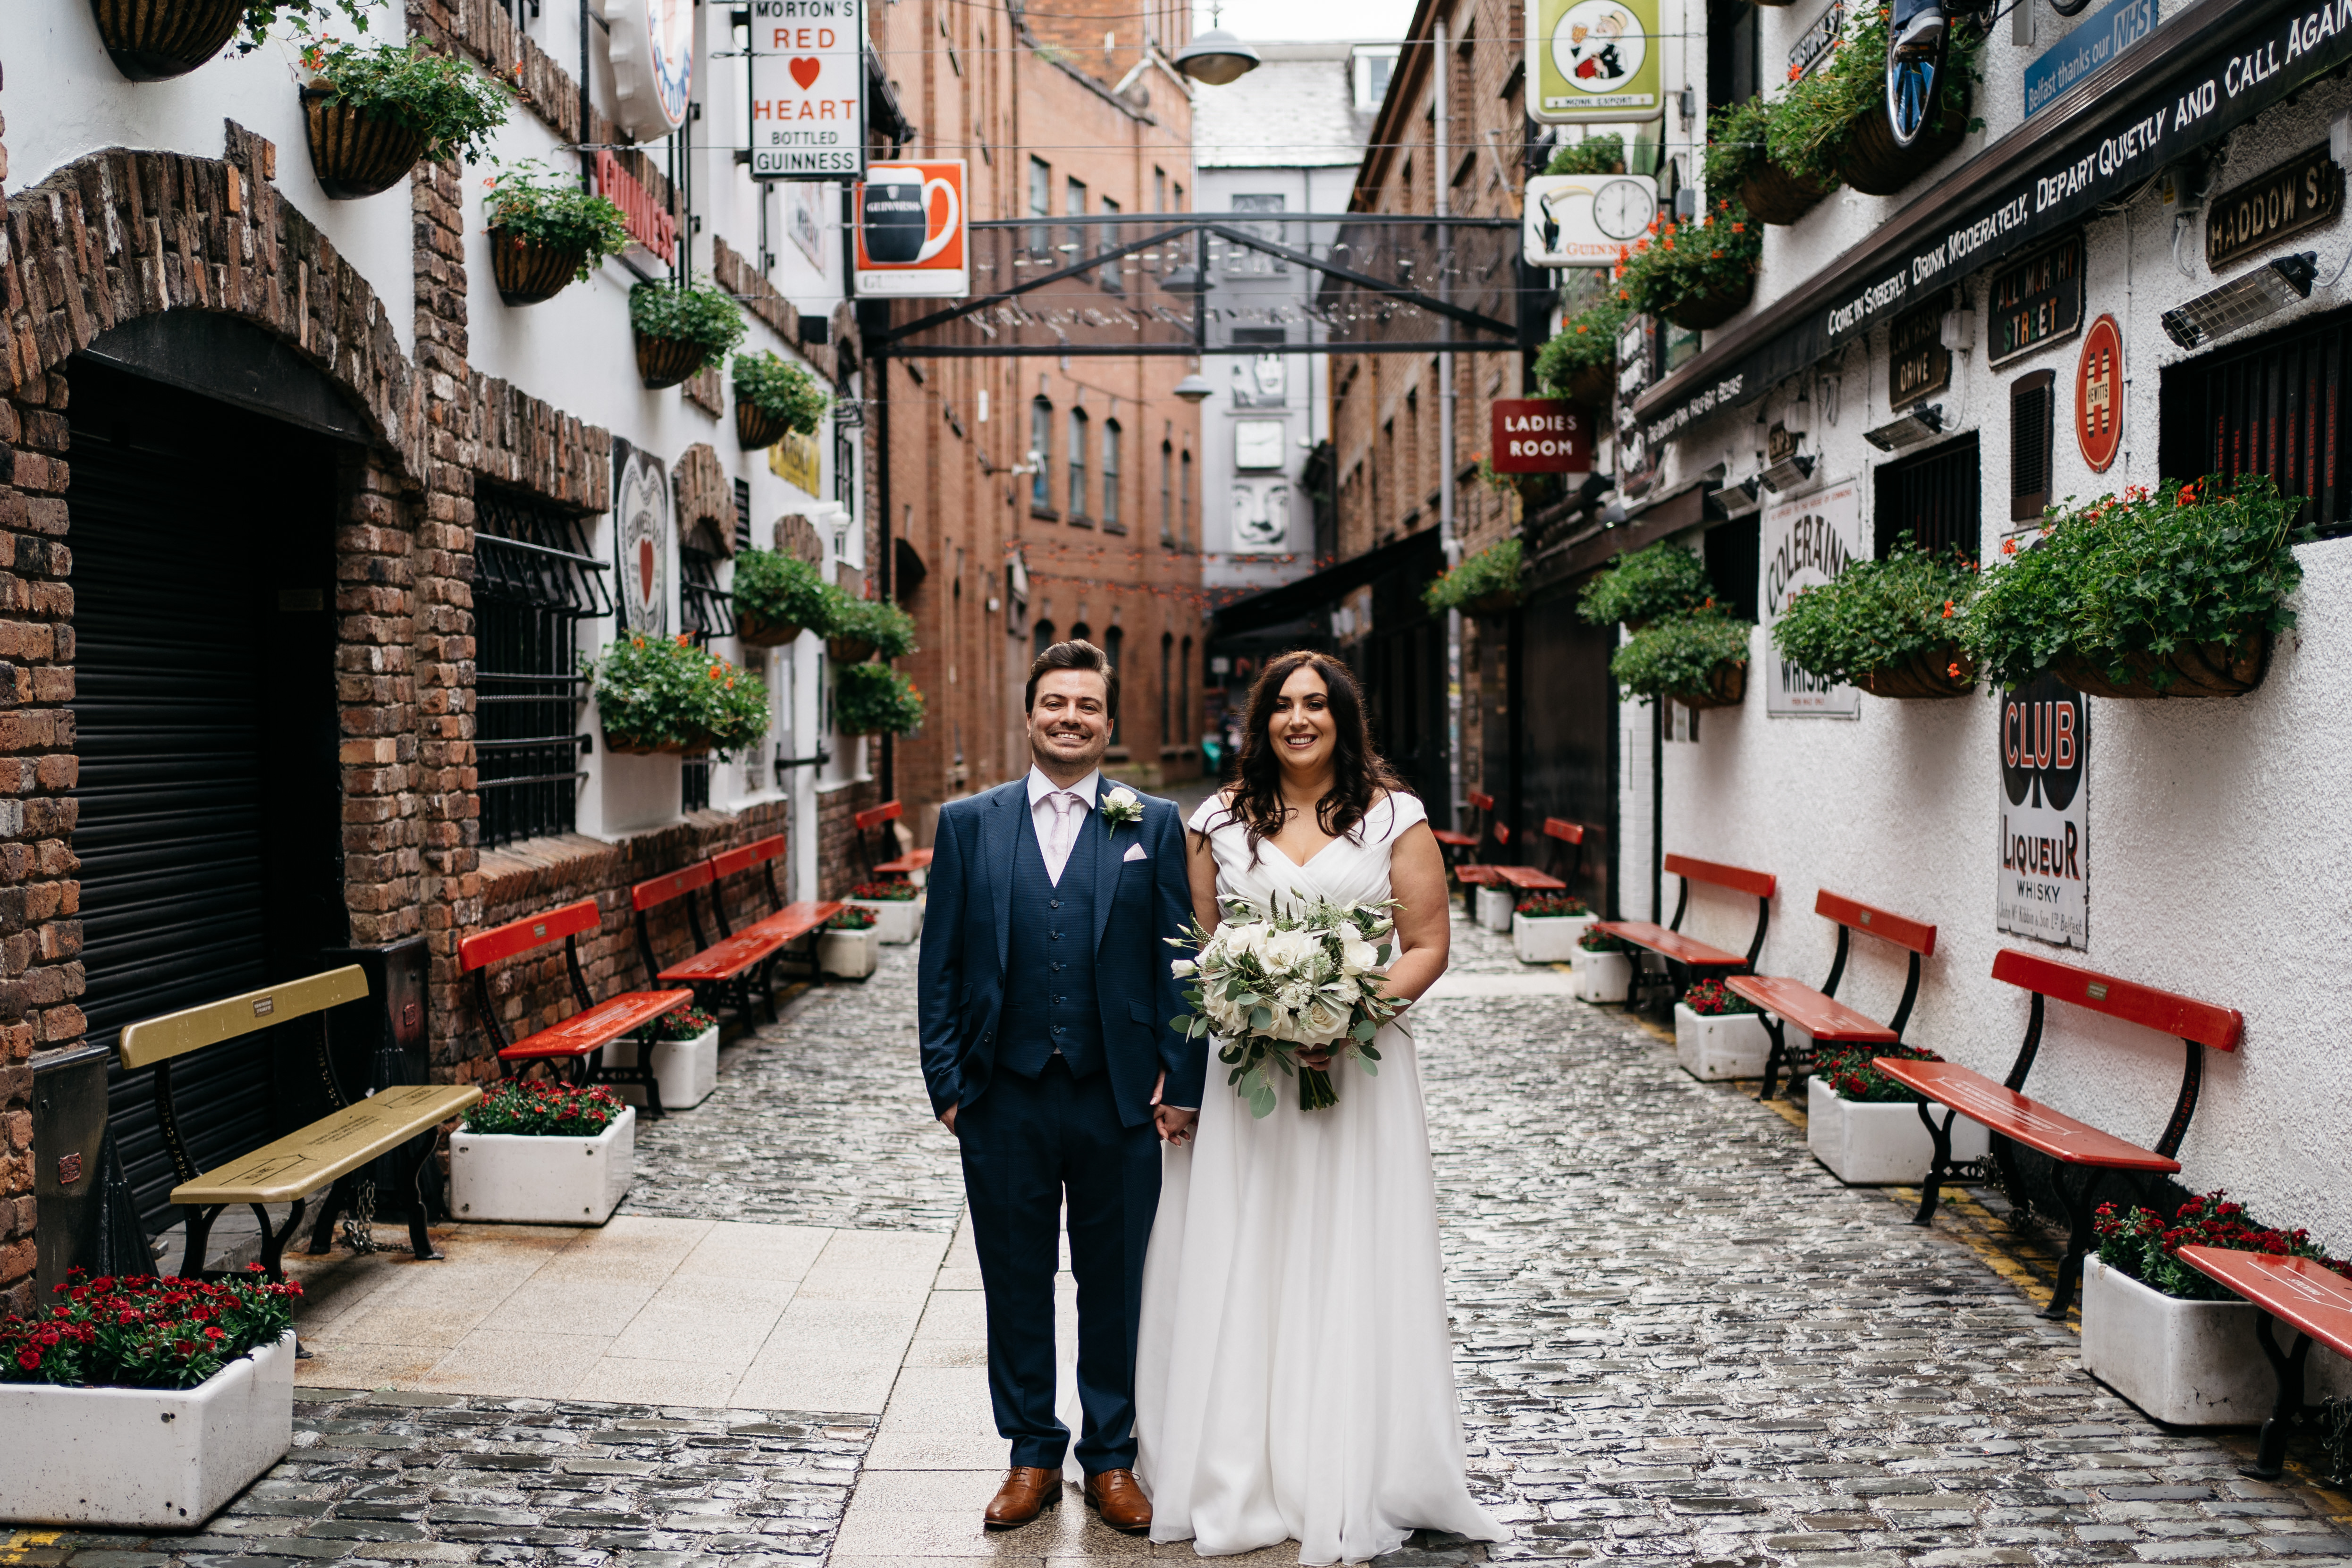 Sarah & Darren http://thethreebearsphotography.com